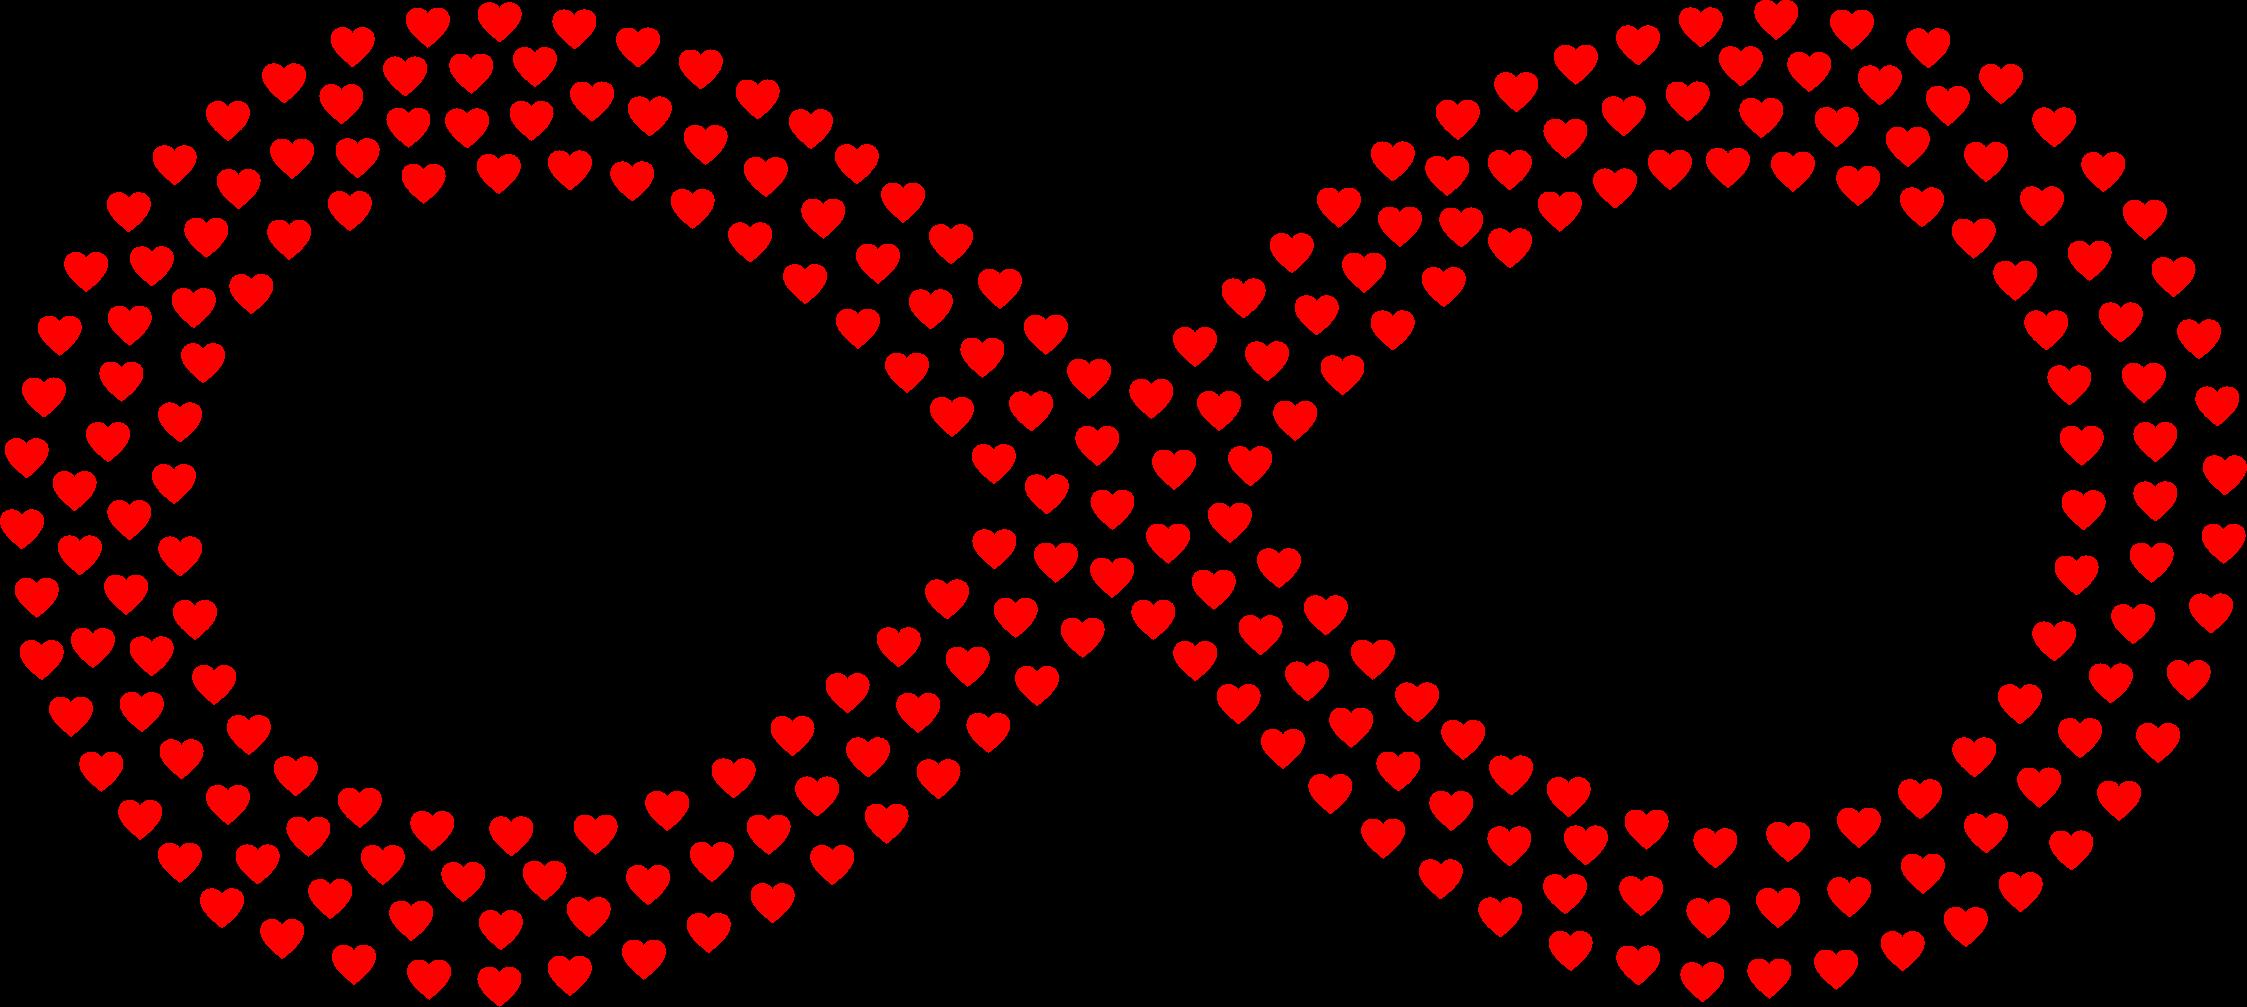 Clipart Infinite Love